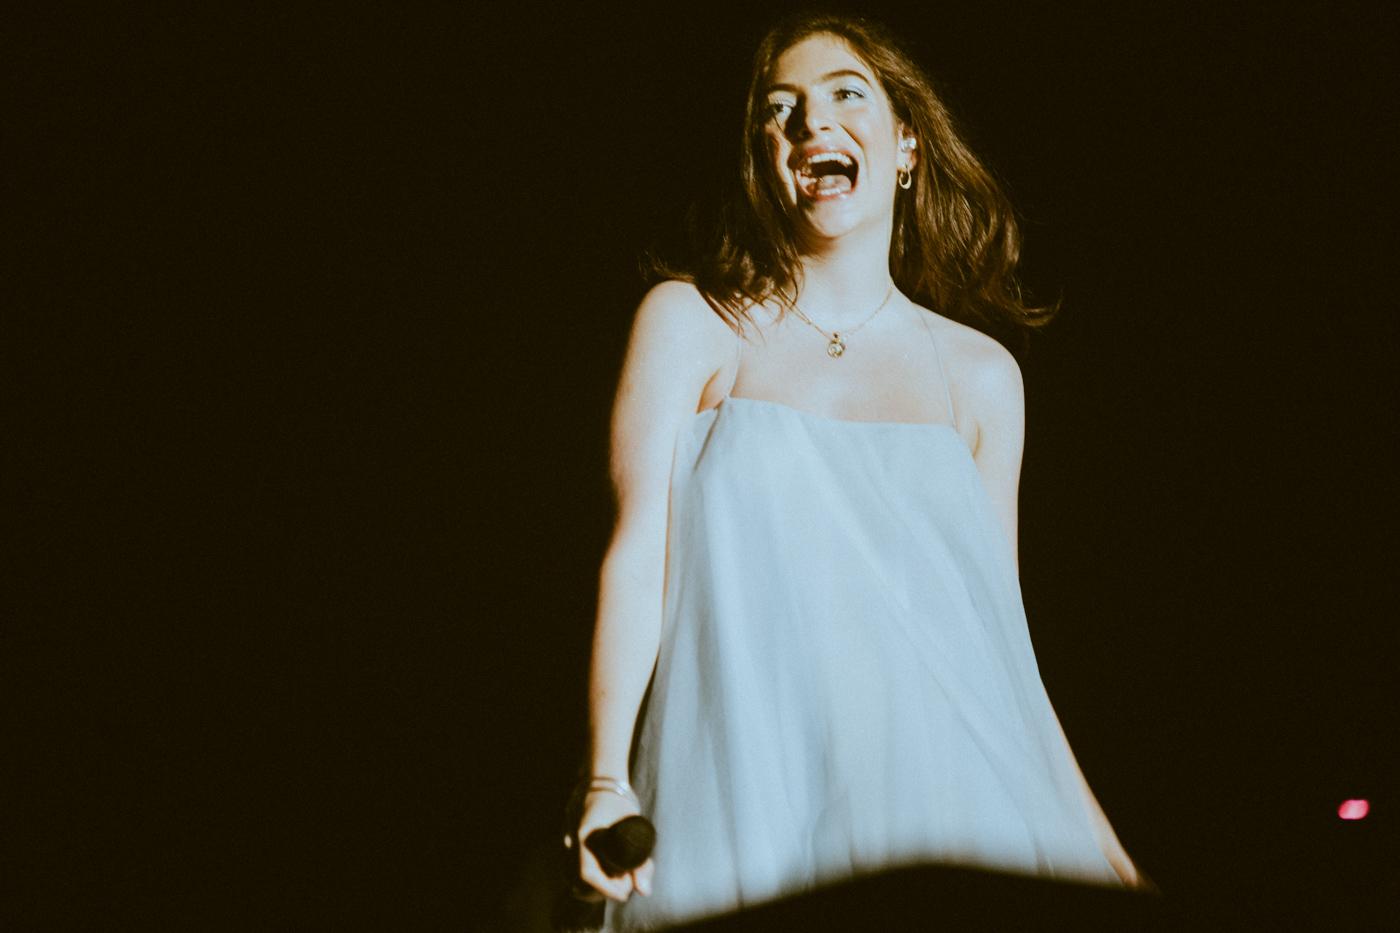 Lorde, photo by Kimberley Ross